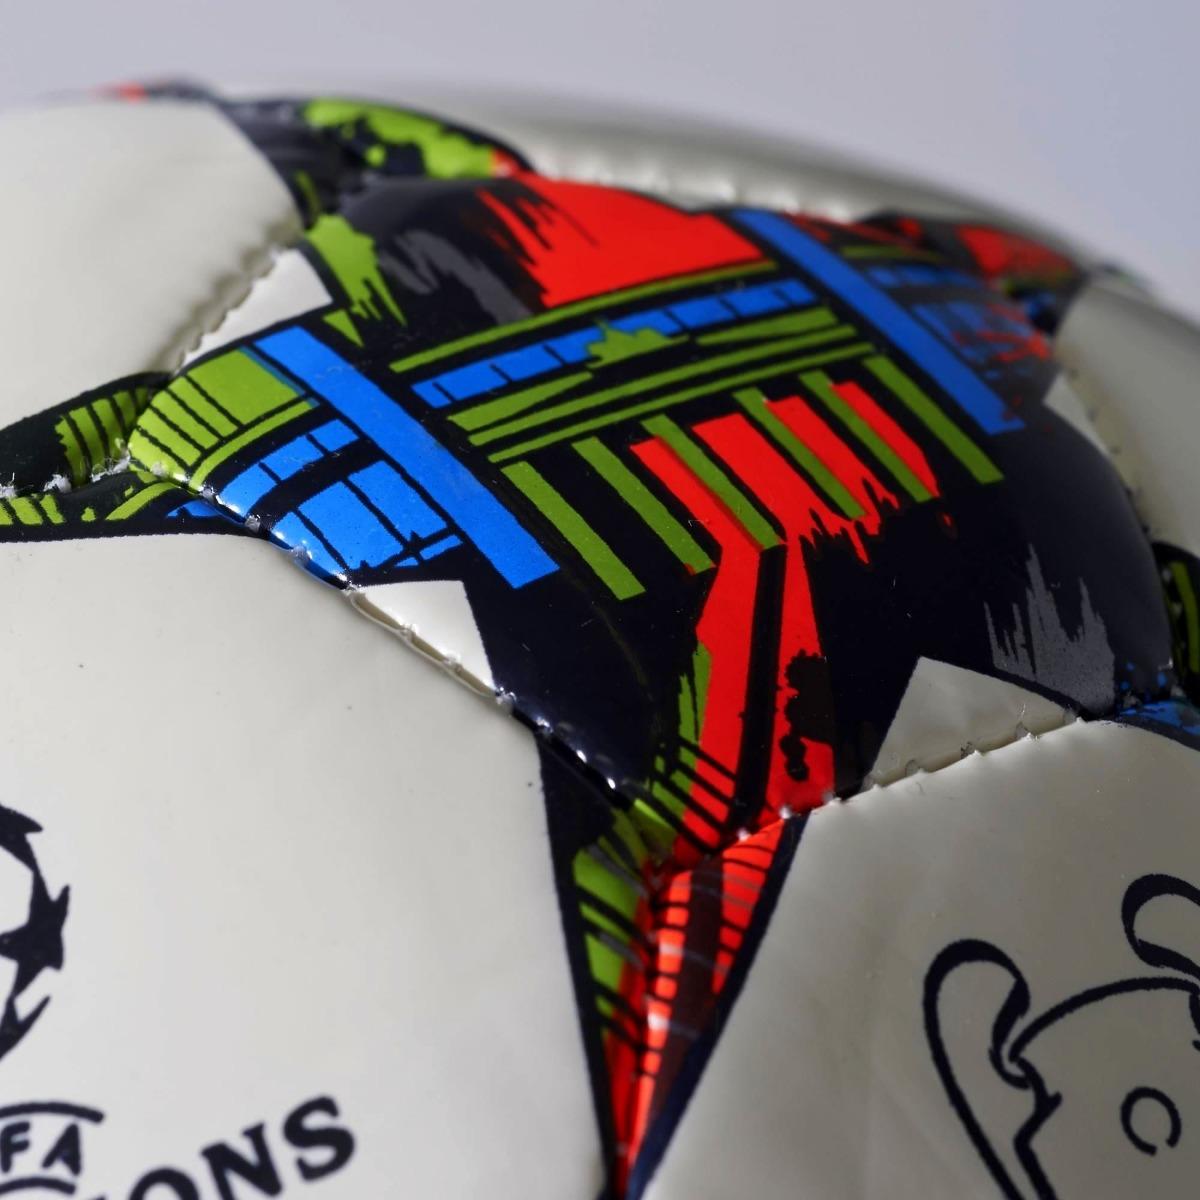 a6de0d010892b mini pelota uefa champions league final berlin 2015 adidas. Cargando zoom.